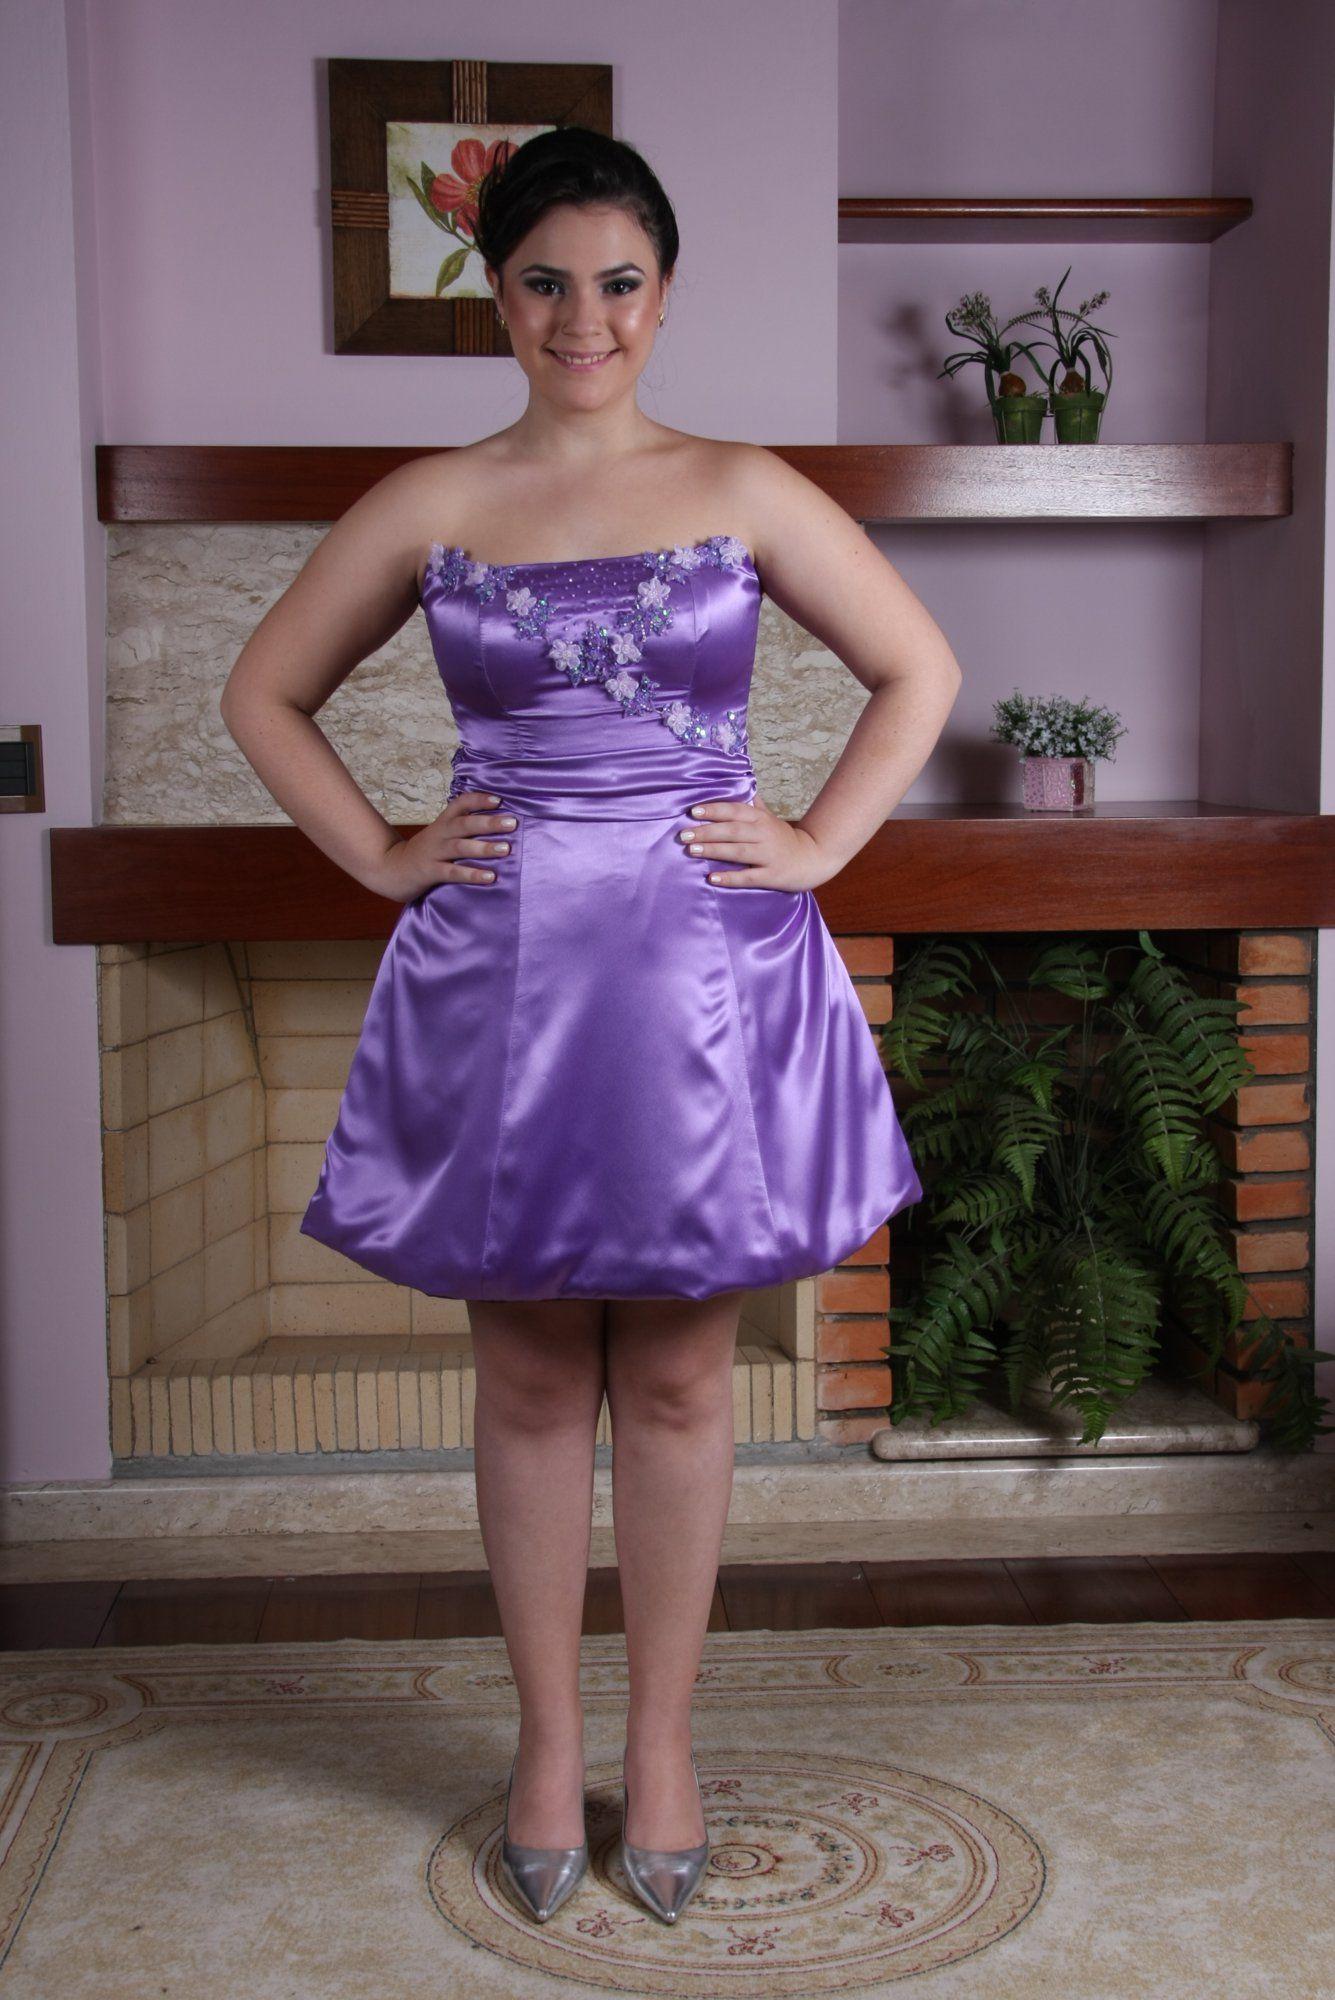 Vestido de Debutante Lilas - 7 - Hipnose Alta Costura e Spa para Noivas e Noivos - Campinas - SP Vestido de Debutante, Vestido de Debutante Lilas, Hipnose Alta Costura